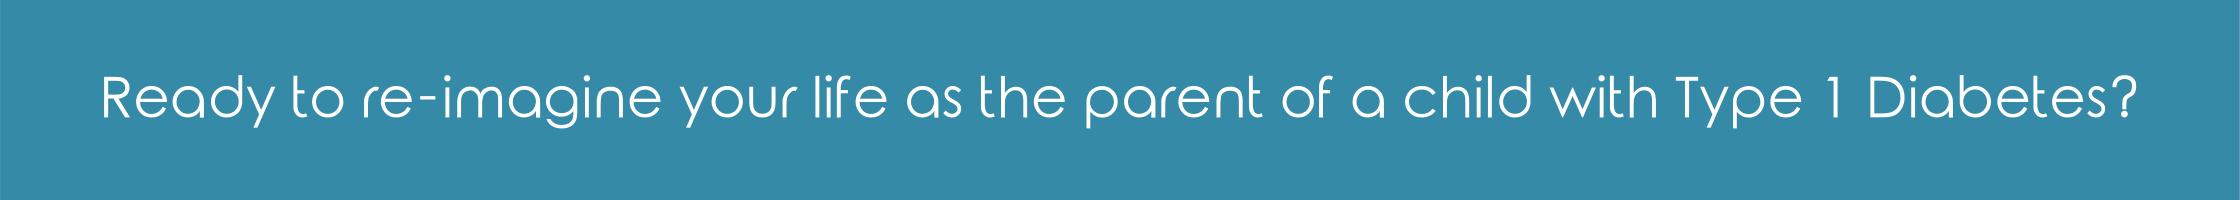 diabetes parent self-care